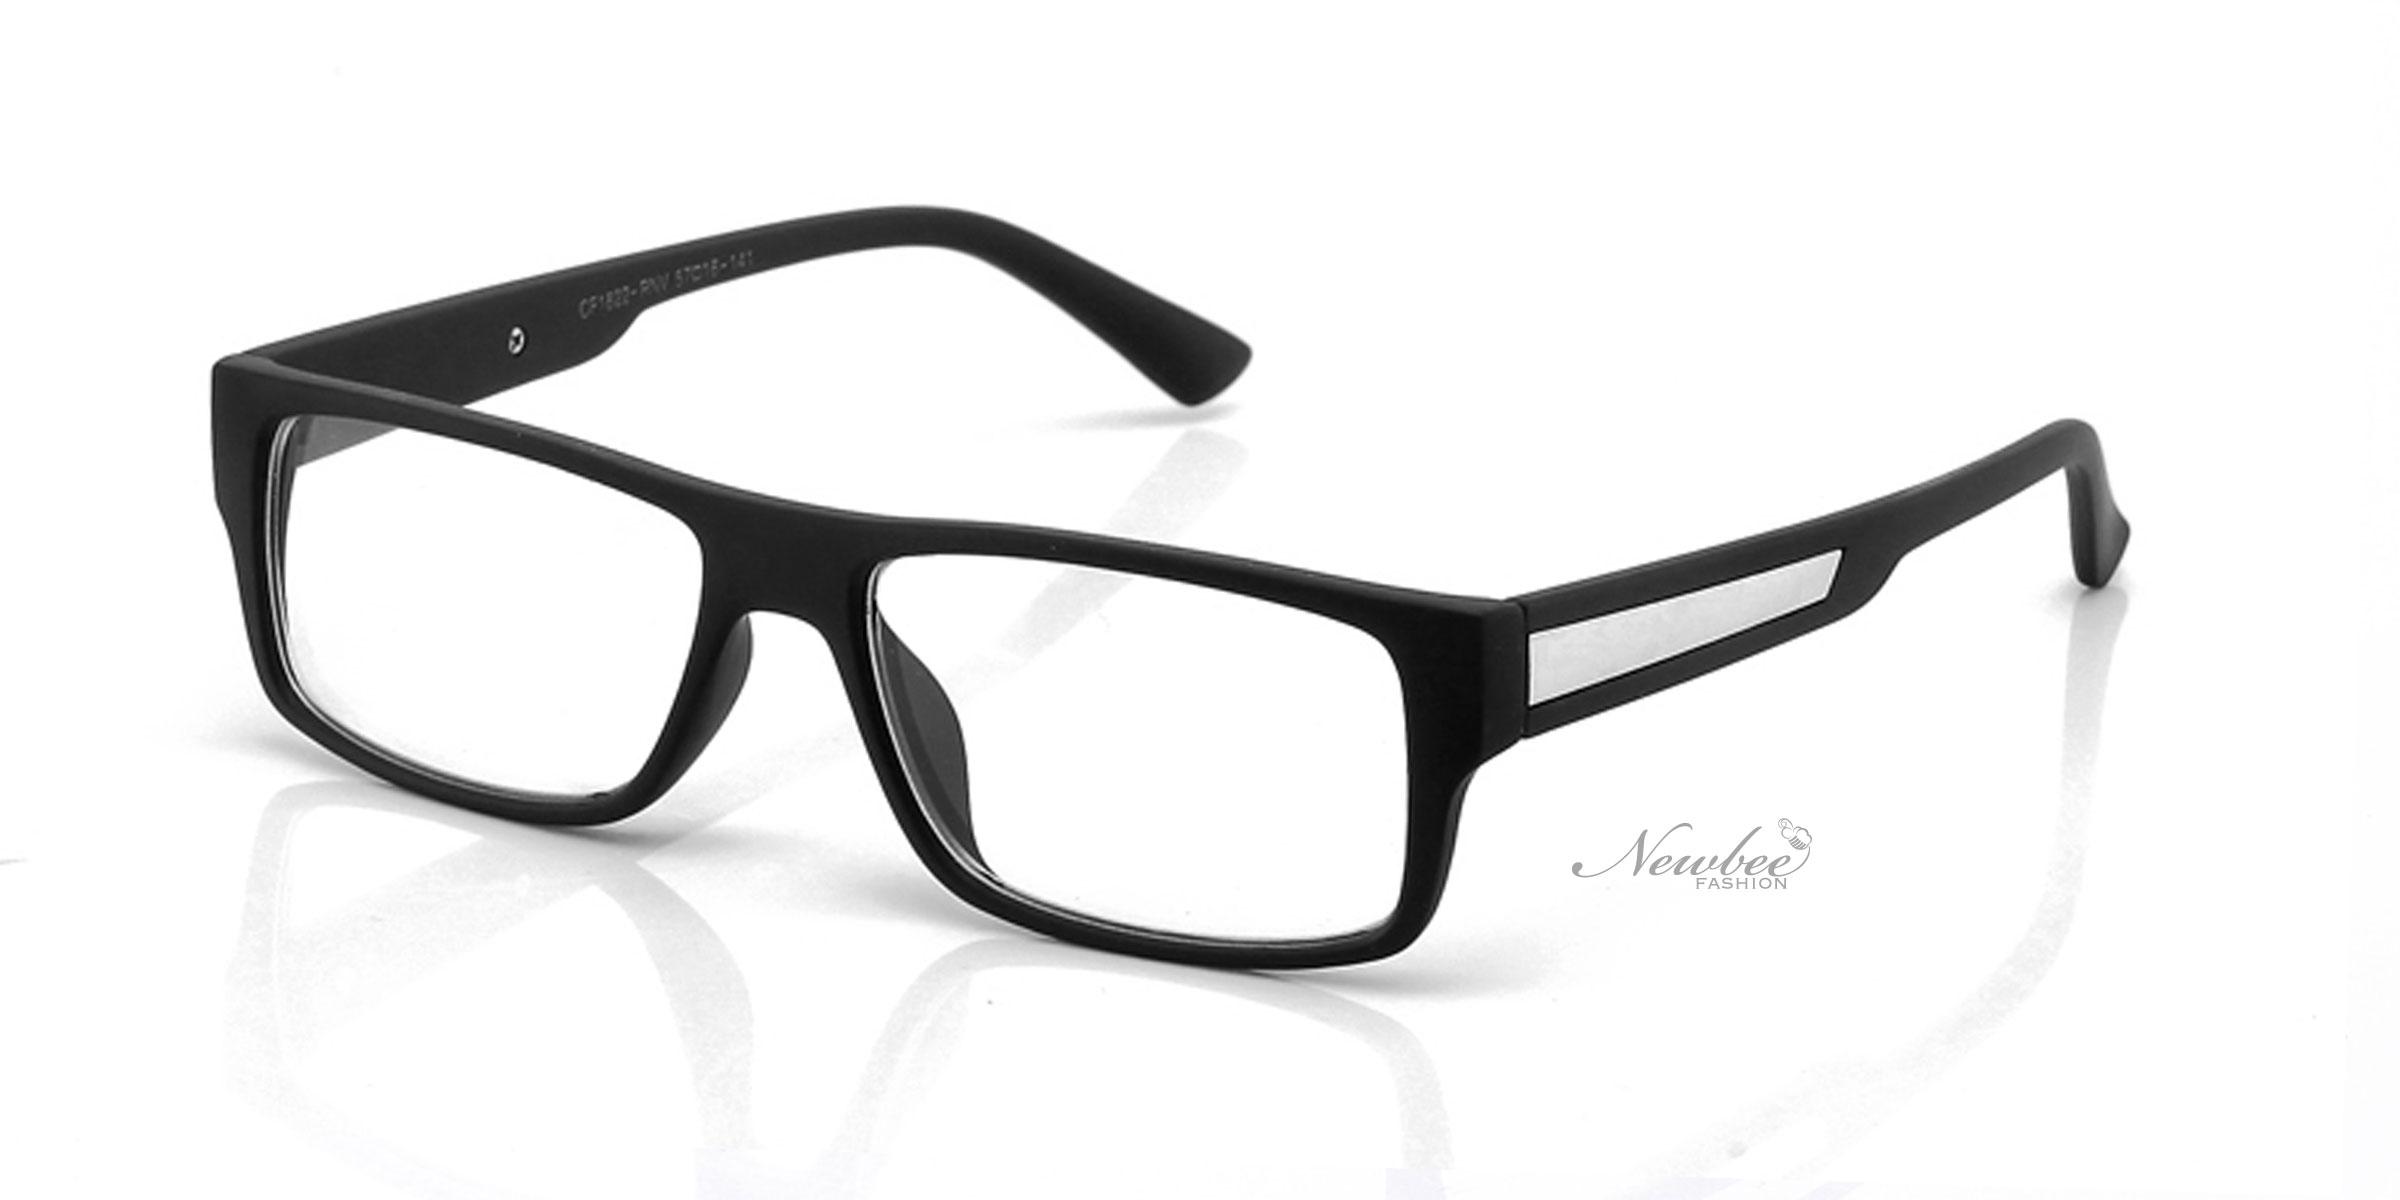 Classic Clear Lens Non Prescription Glasses with a Matte ...